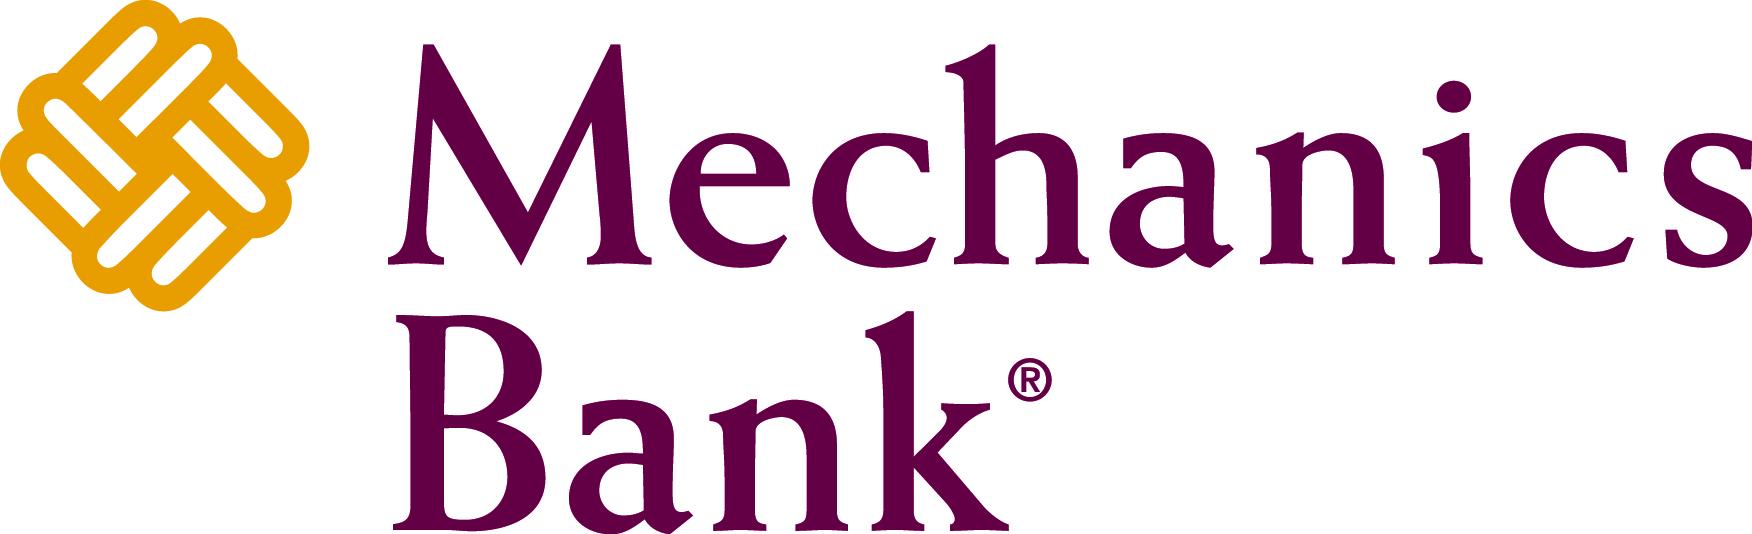 Mechanics logo